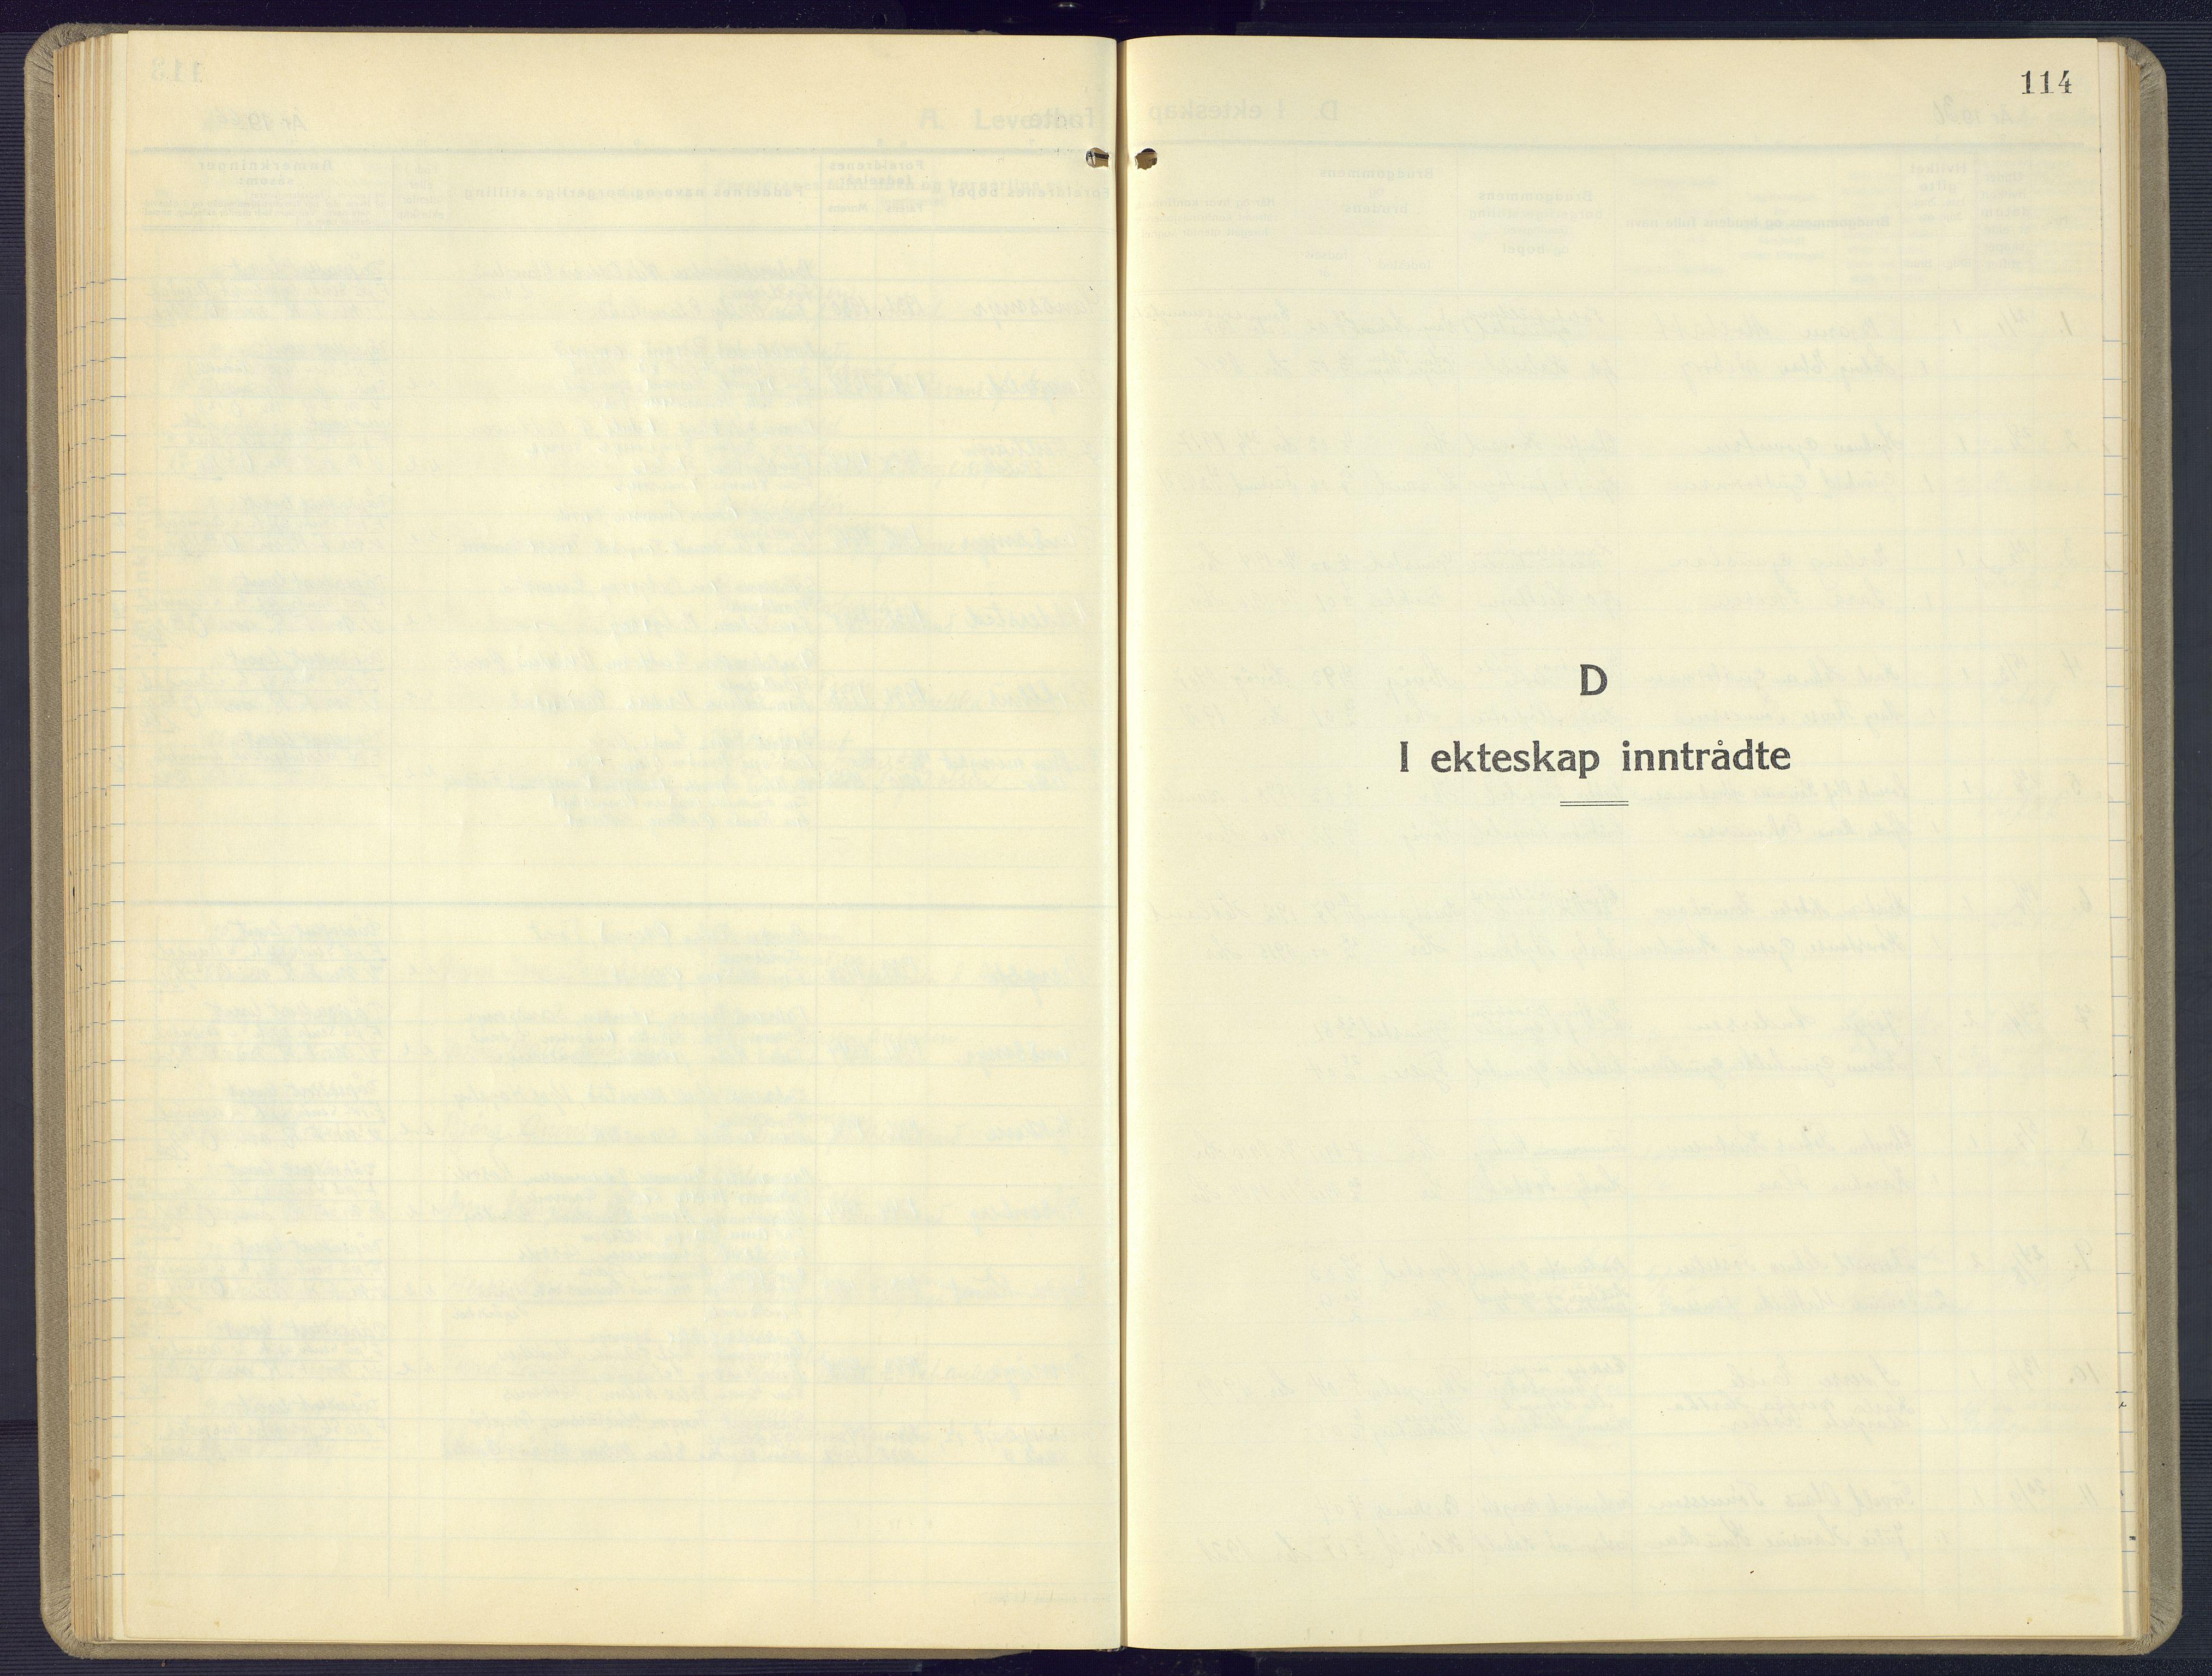 SAK, Vestre Moland sokneprestkontor, F/Fb/Fbb/L0008: Klokkerbok nr. B 8, 1930-1966, s. 114